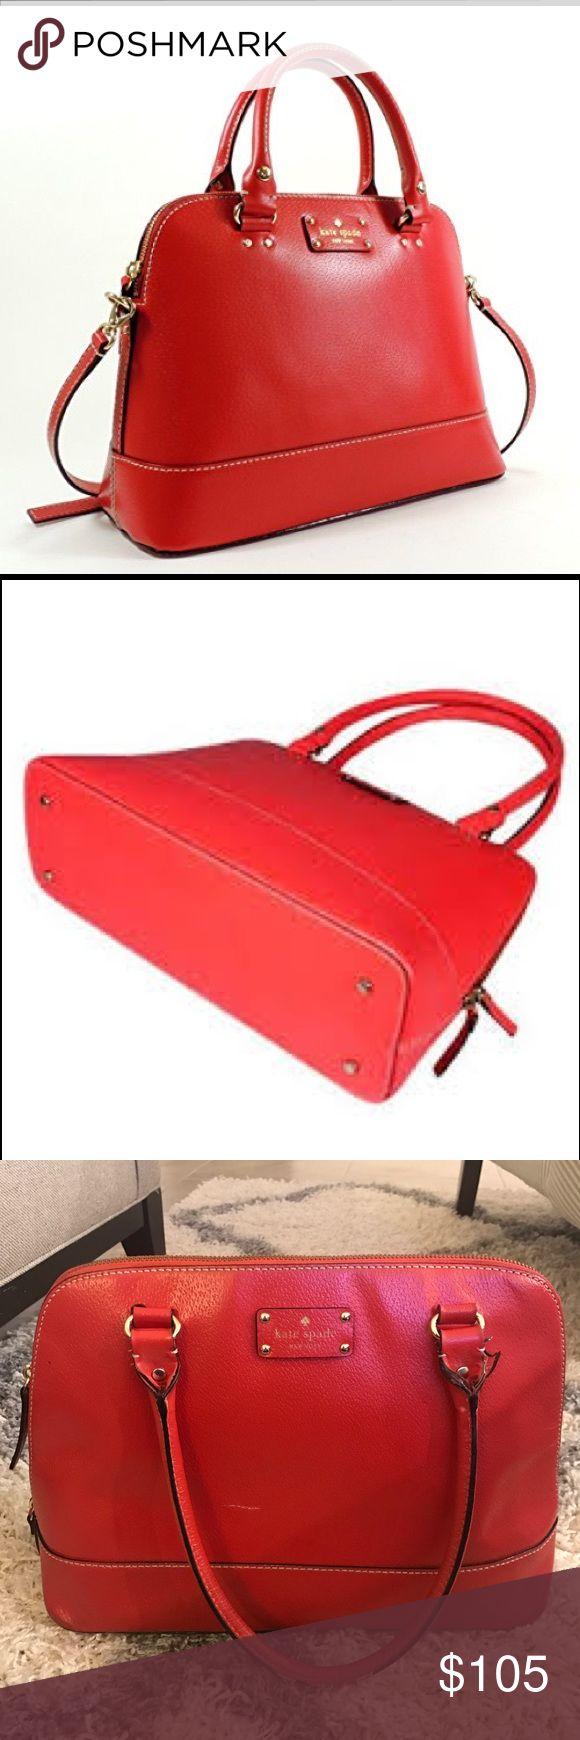 Kate Spade Wellesley Rachelle handbag Kate Spade Wellesley Rachelle red handbag. Little tear, as shown in pictures - price reflects. kate spade Bags